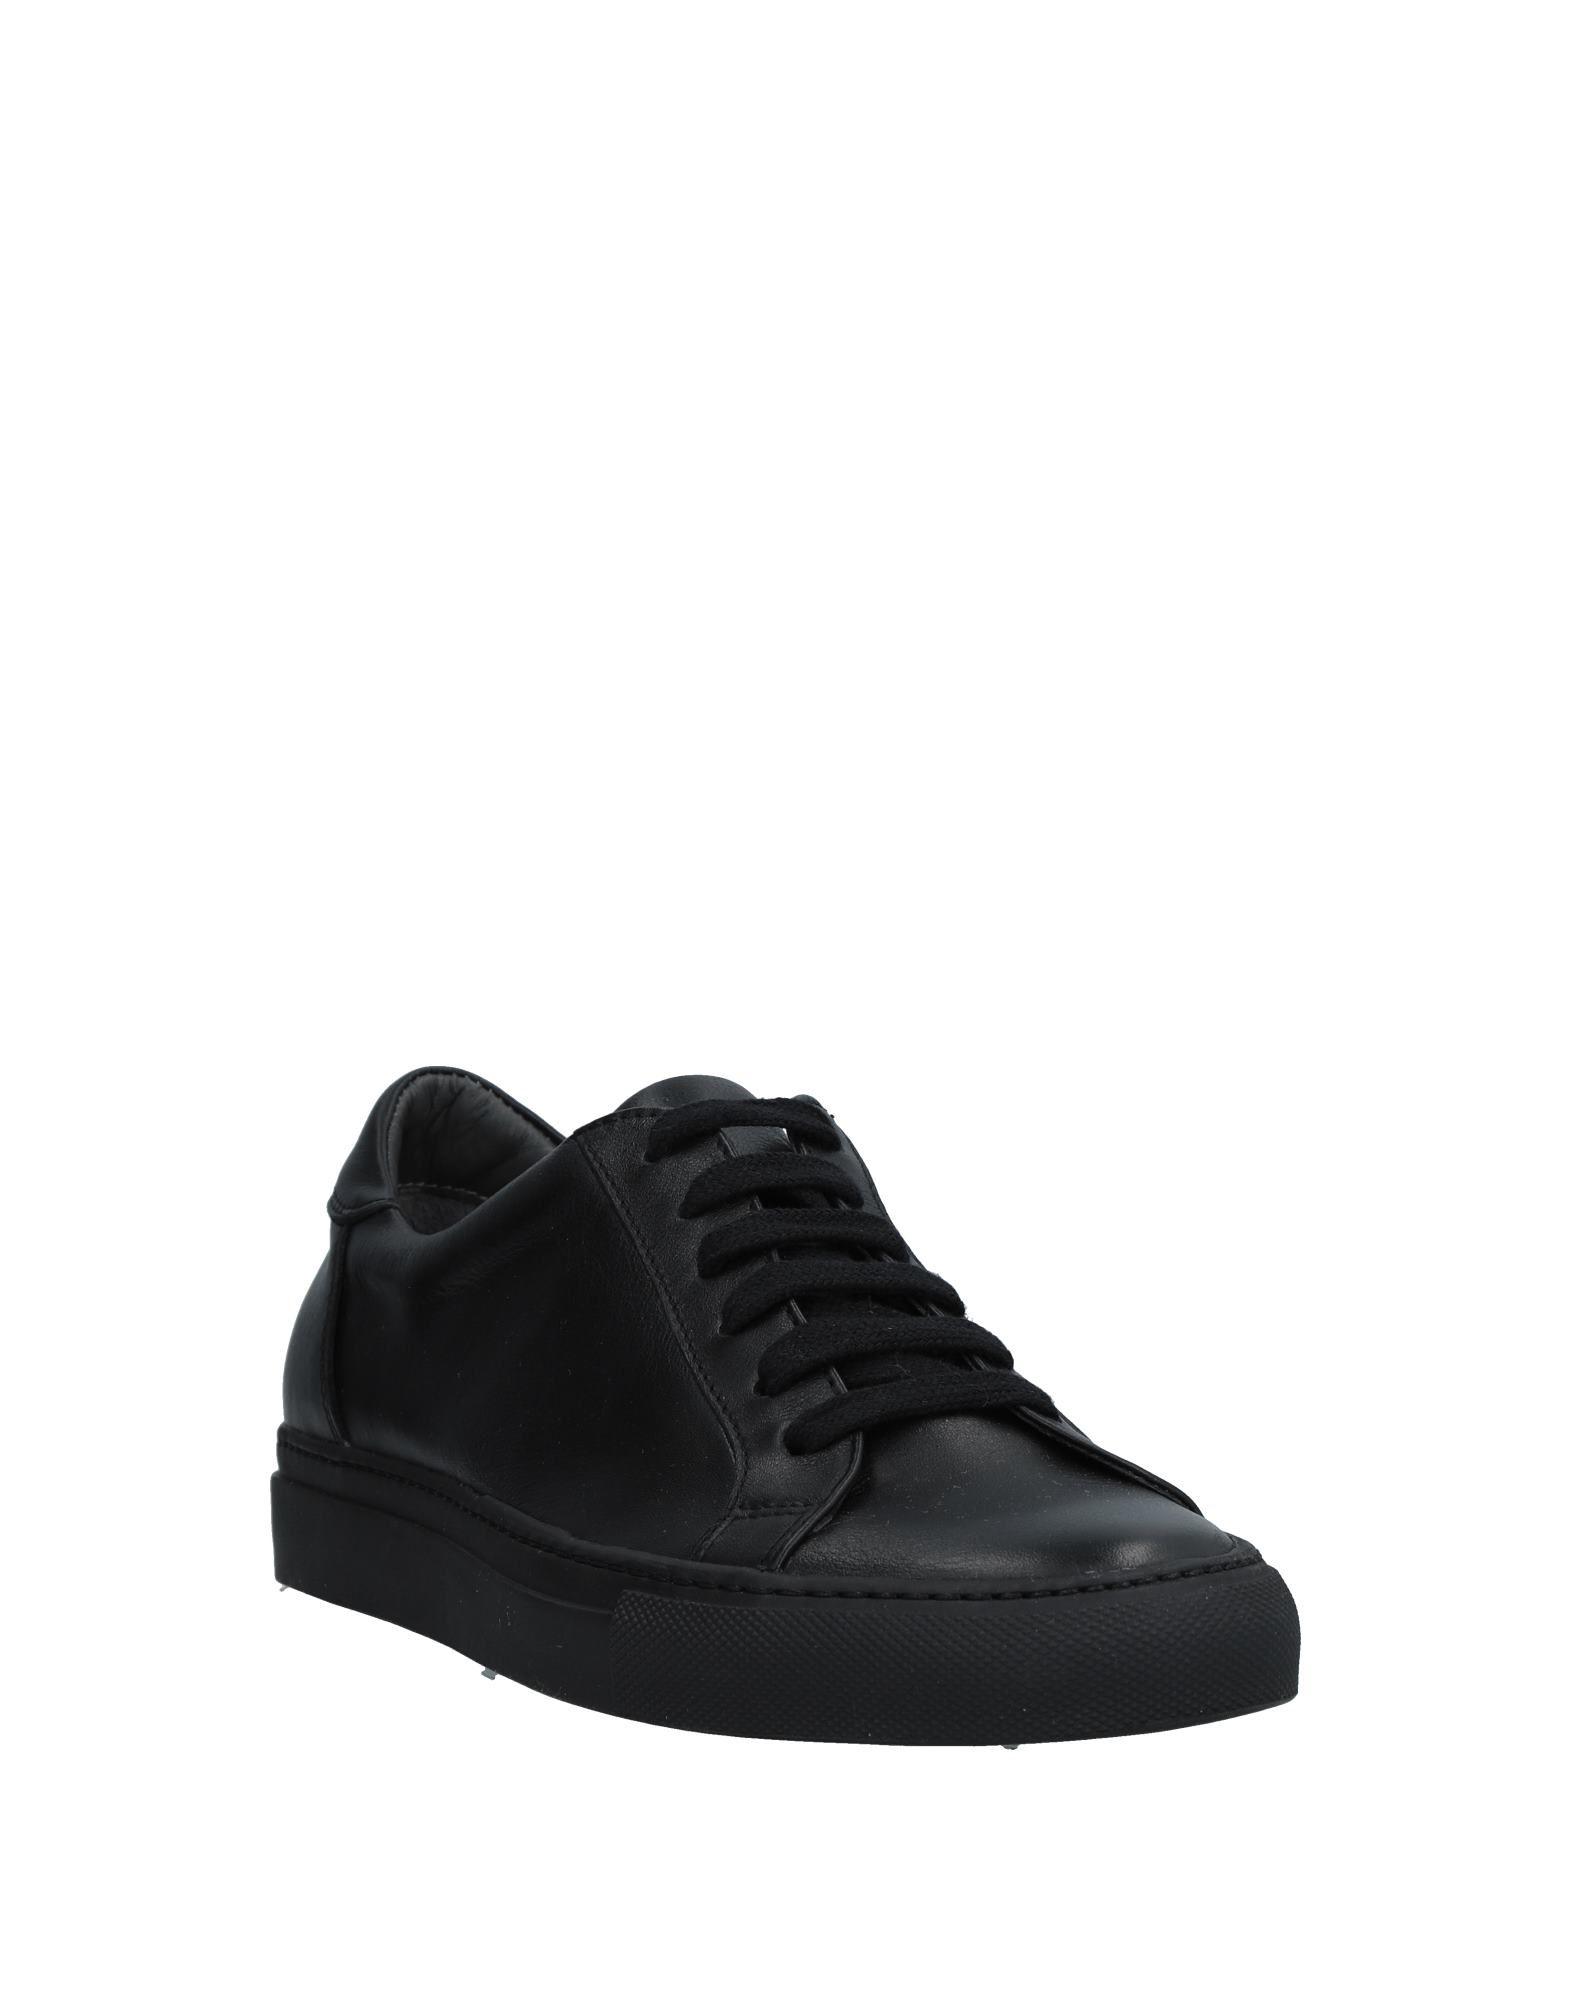 11535049PA Gordon Sneakers Herren  11535049PA  ada4c1